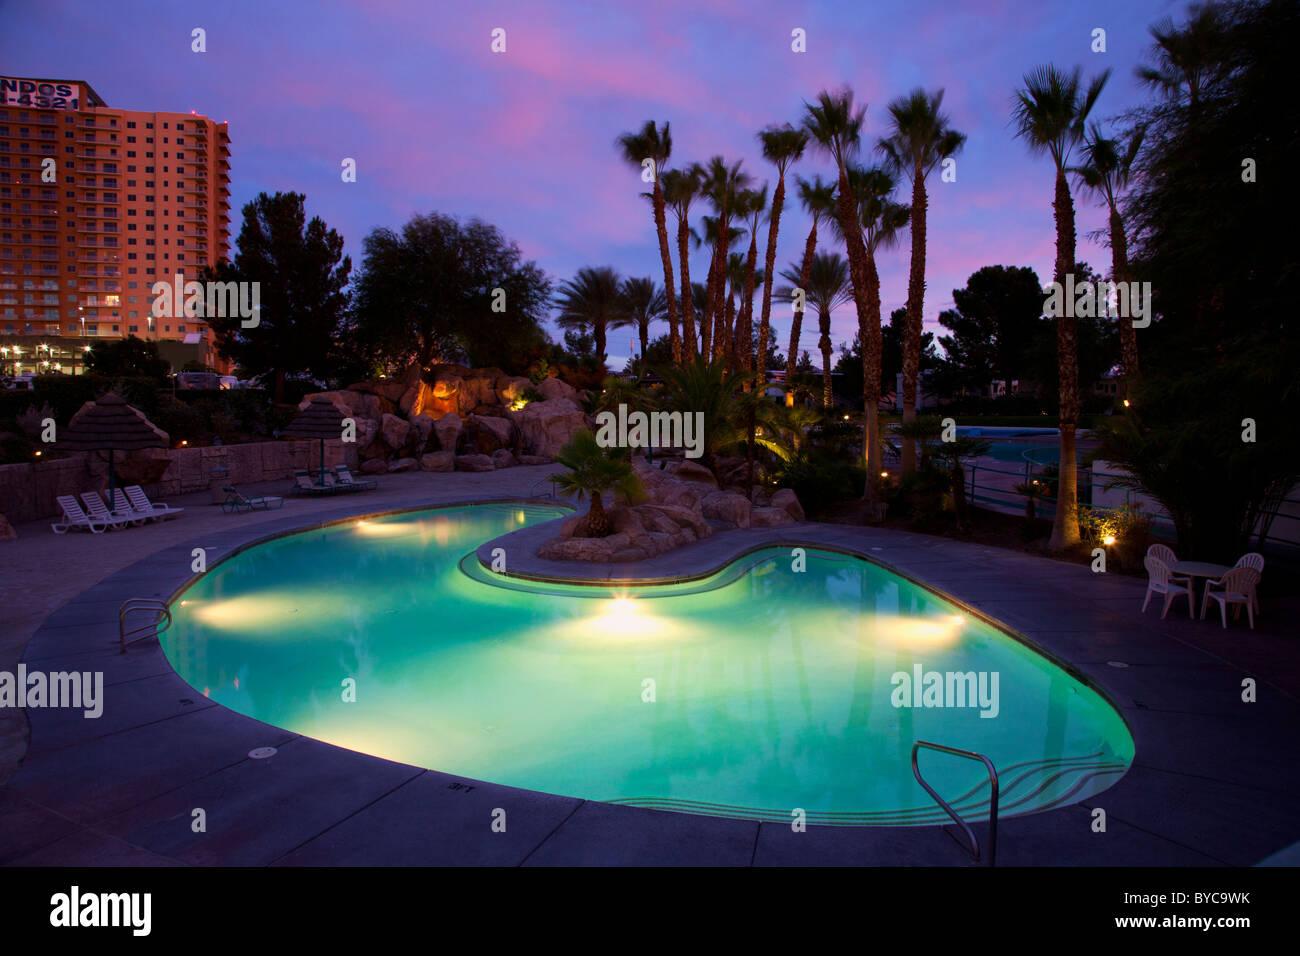 Sunset at Oasis Las Vegas RV Resort, Las Vegas, Nevada - Stock Image